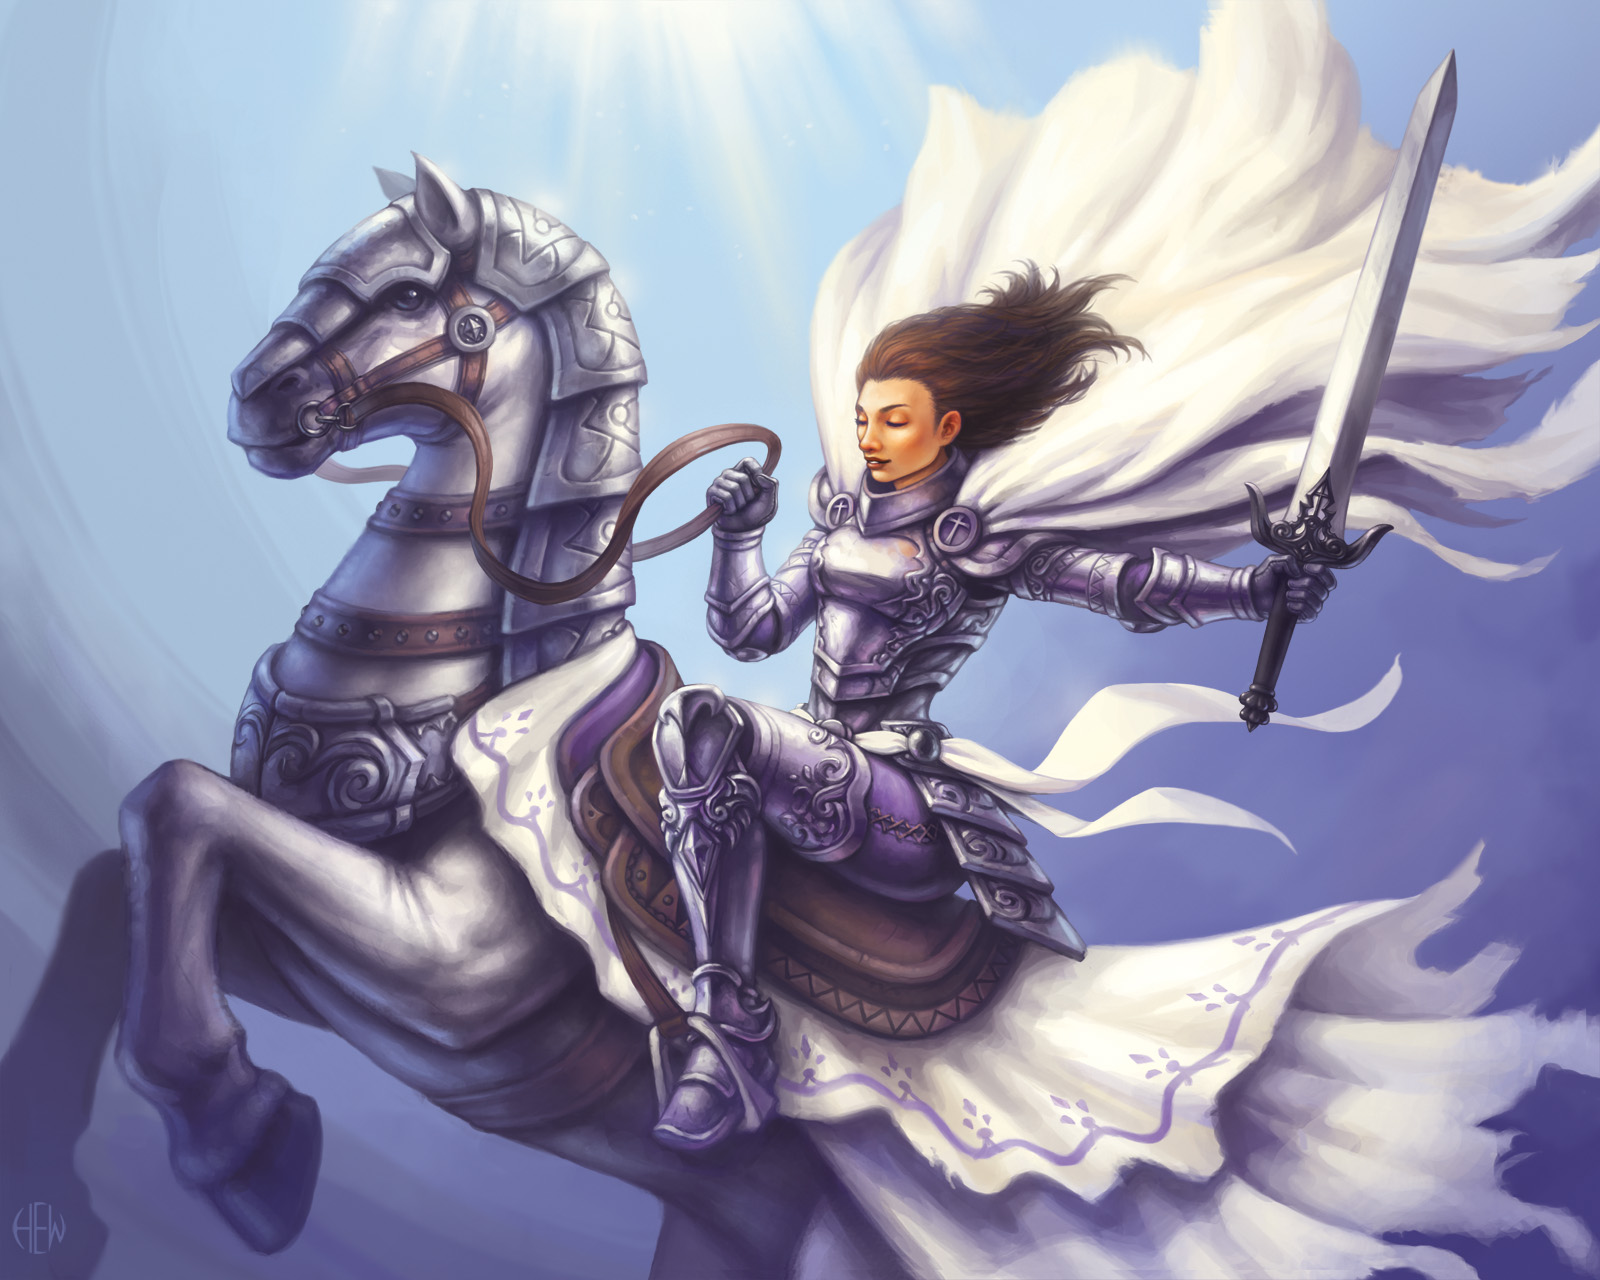 Jocelyn, the Holy Knight